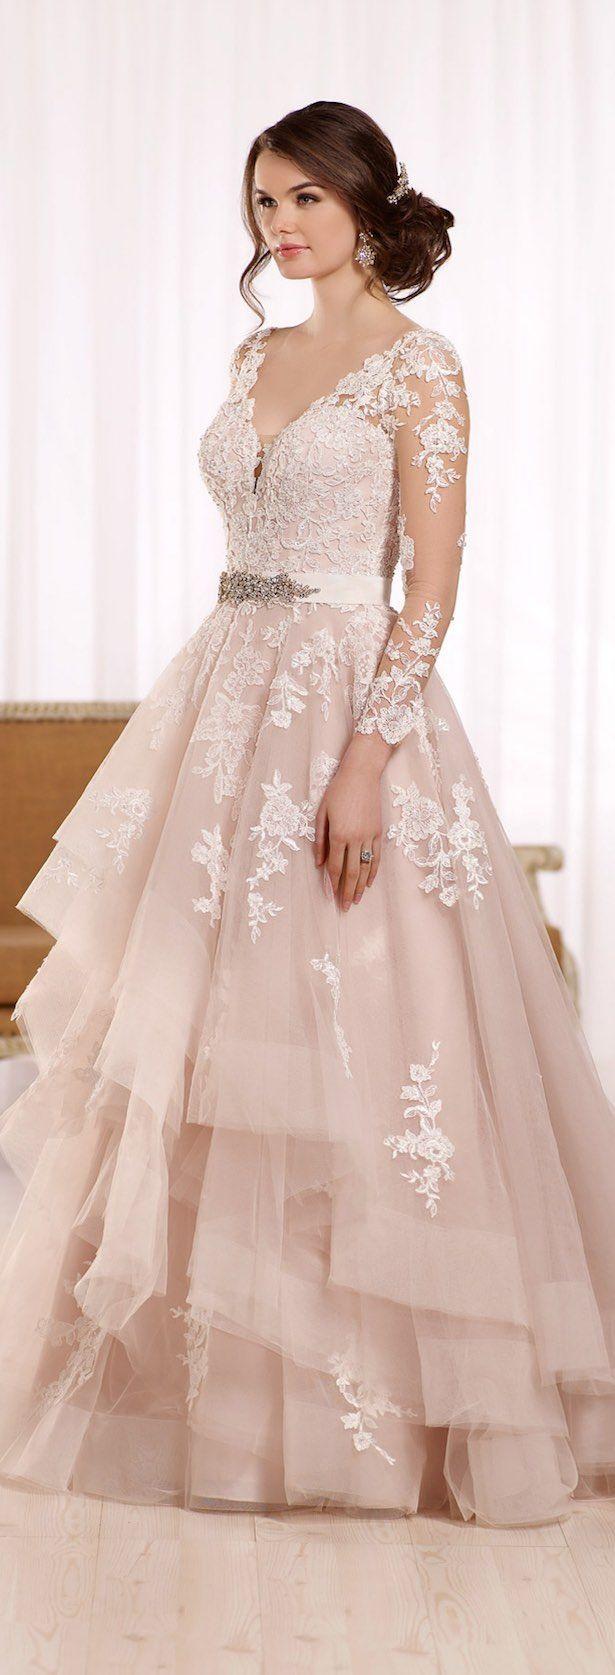 Mejores 310 imágenes de Robe de mariée en Pinterest